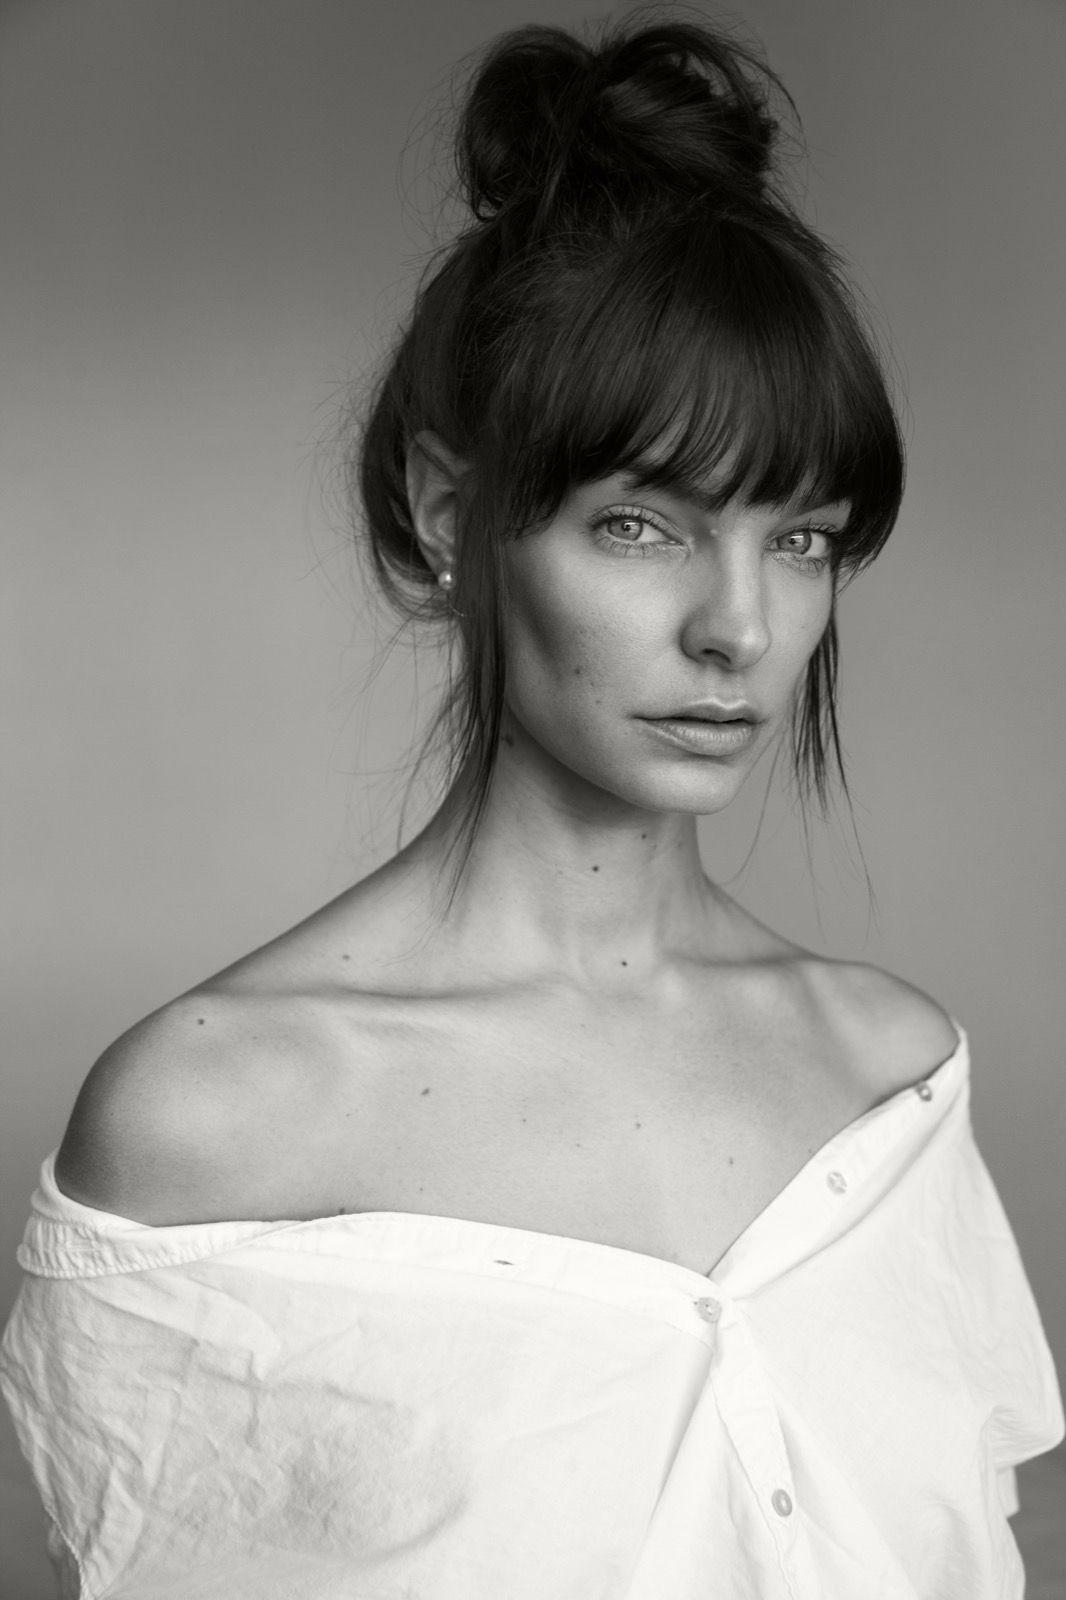 TheFappening Melissa Ceja nude photos 2019